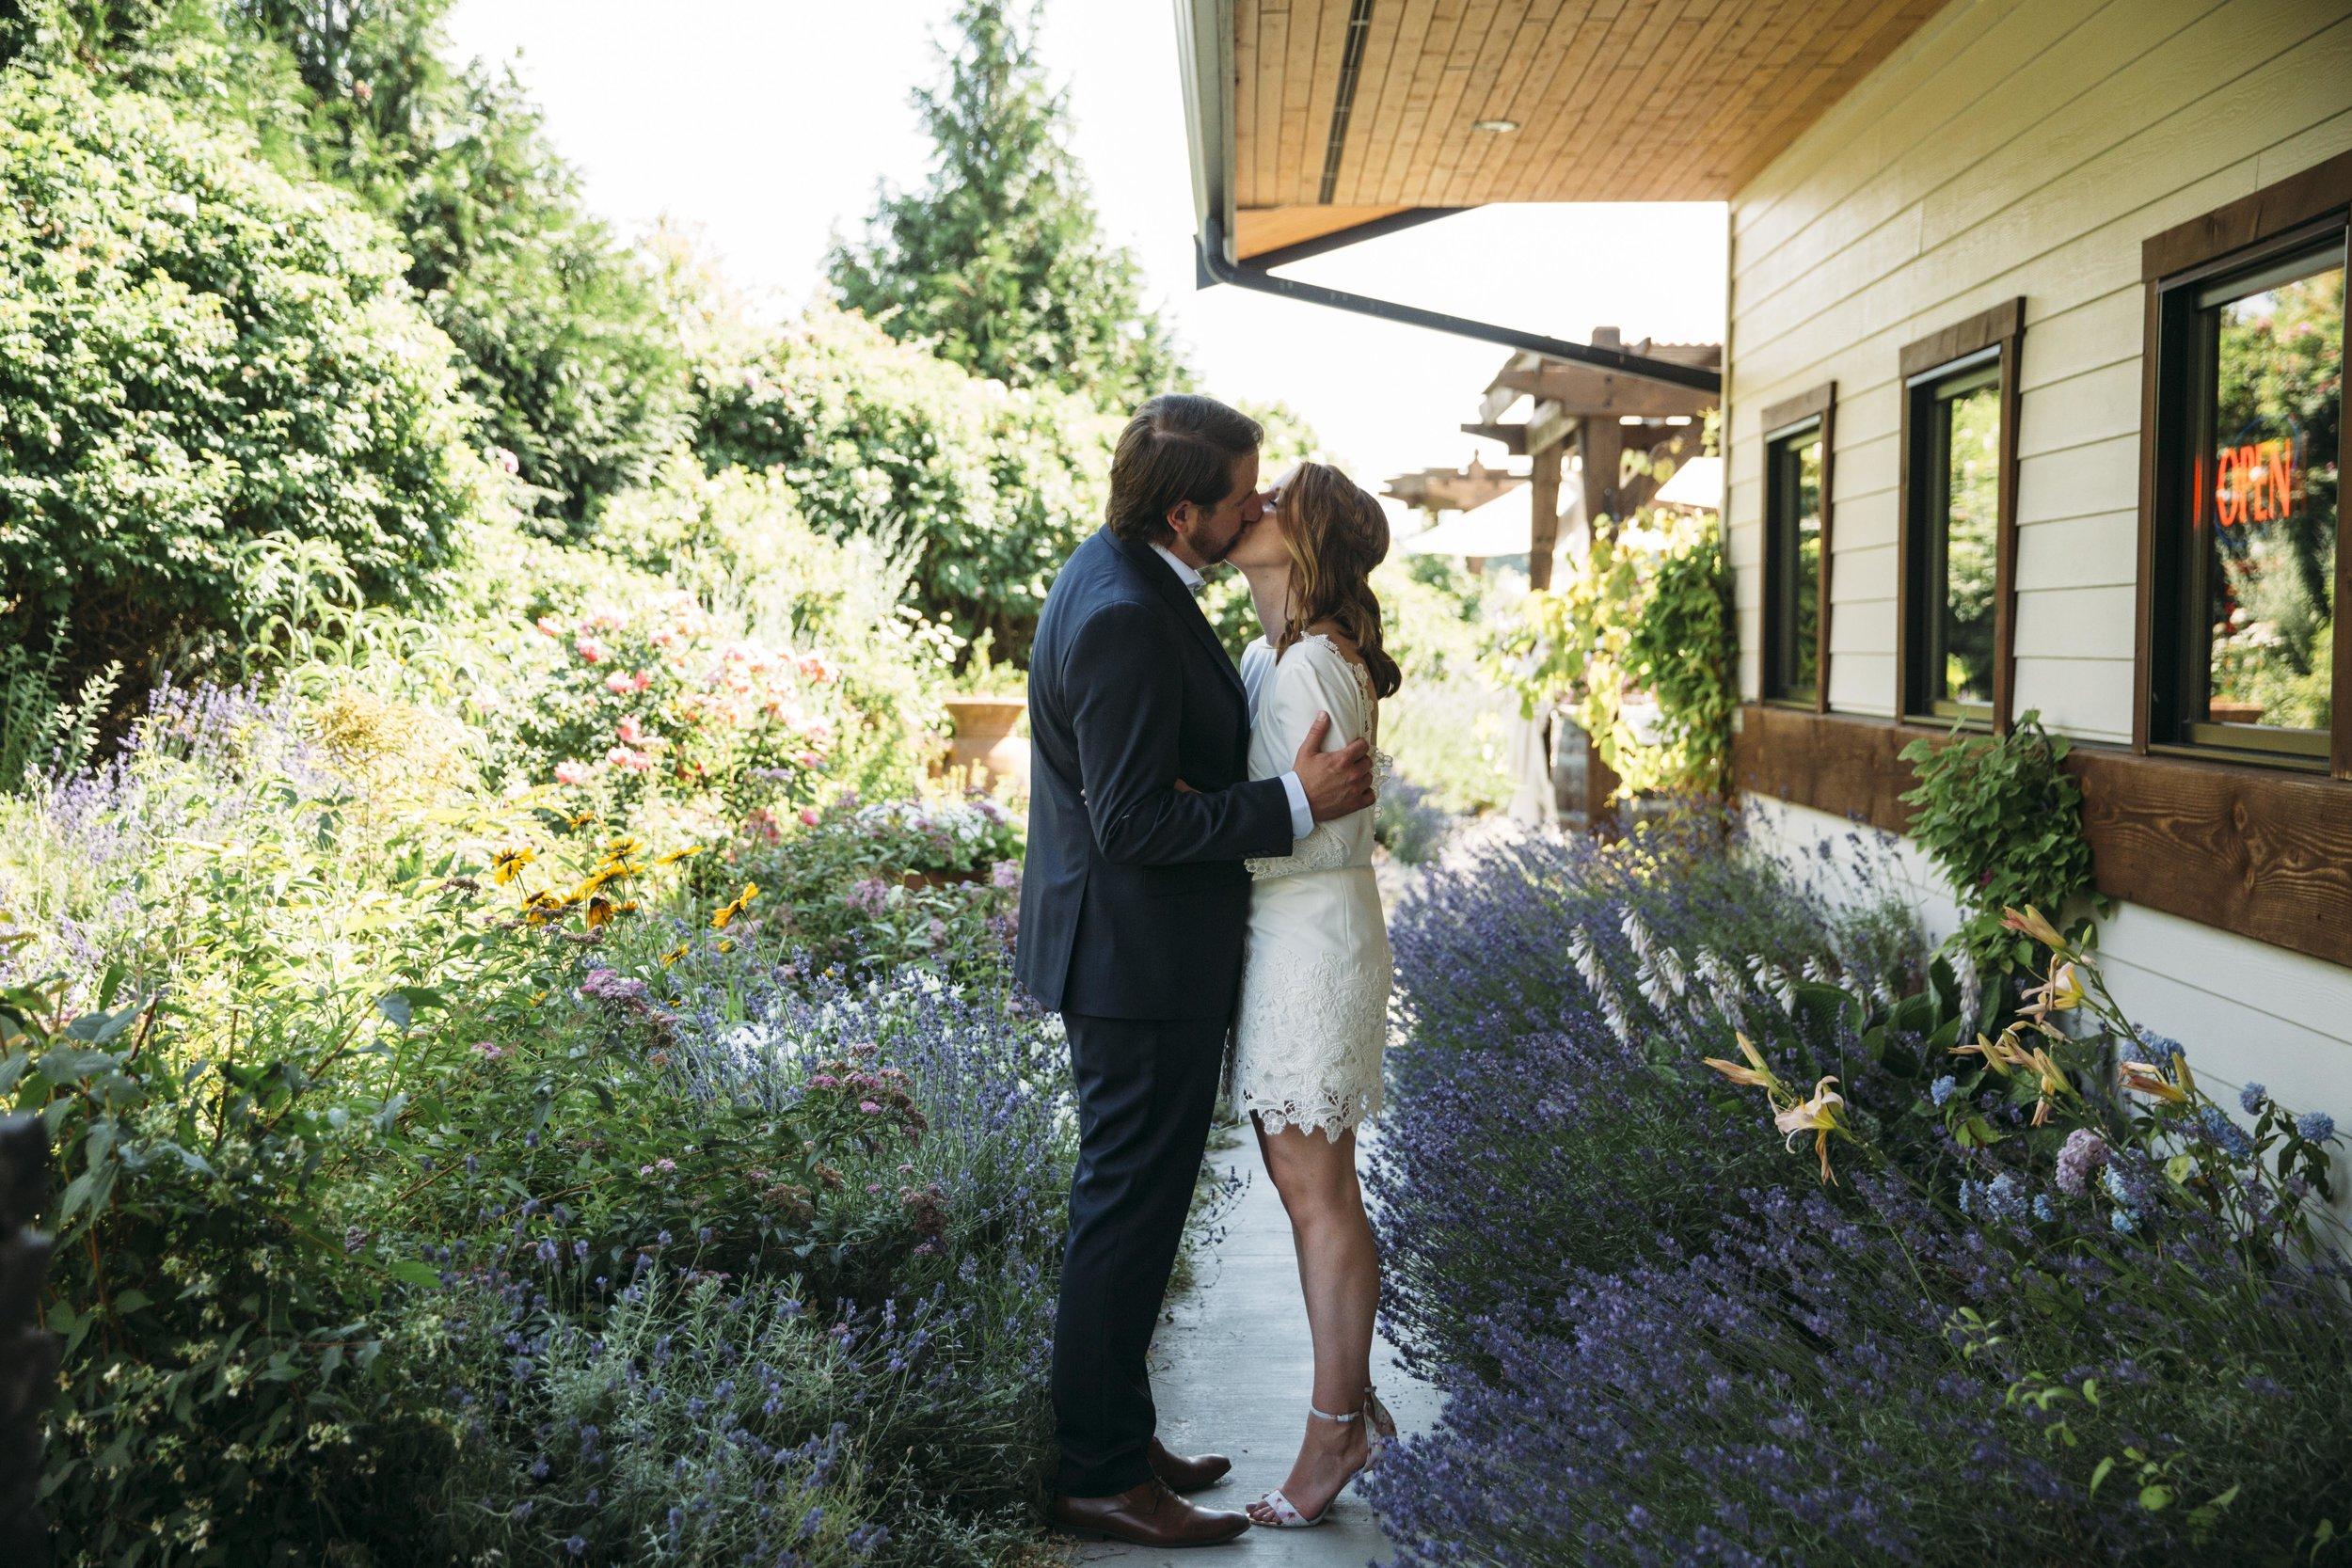 Jakkie & Chris wedding photographs at  Ancient Hills Winery  in Kelowna